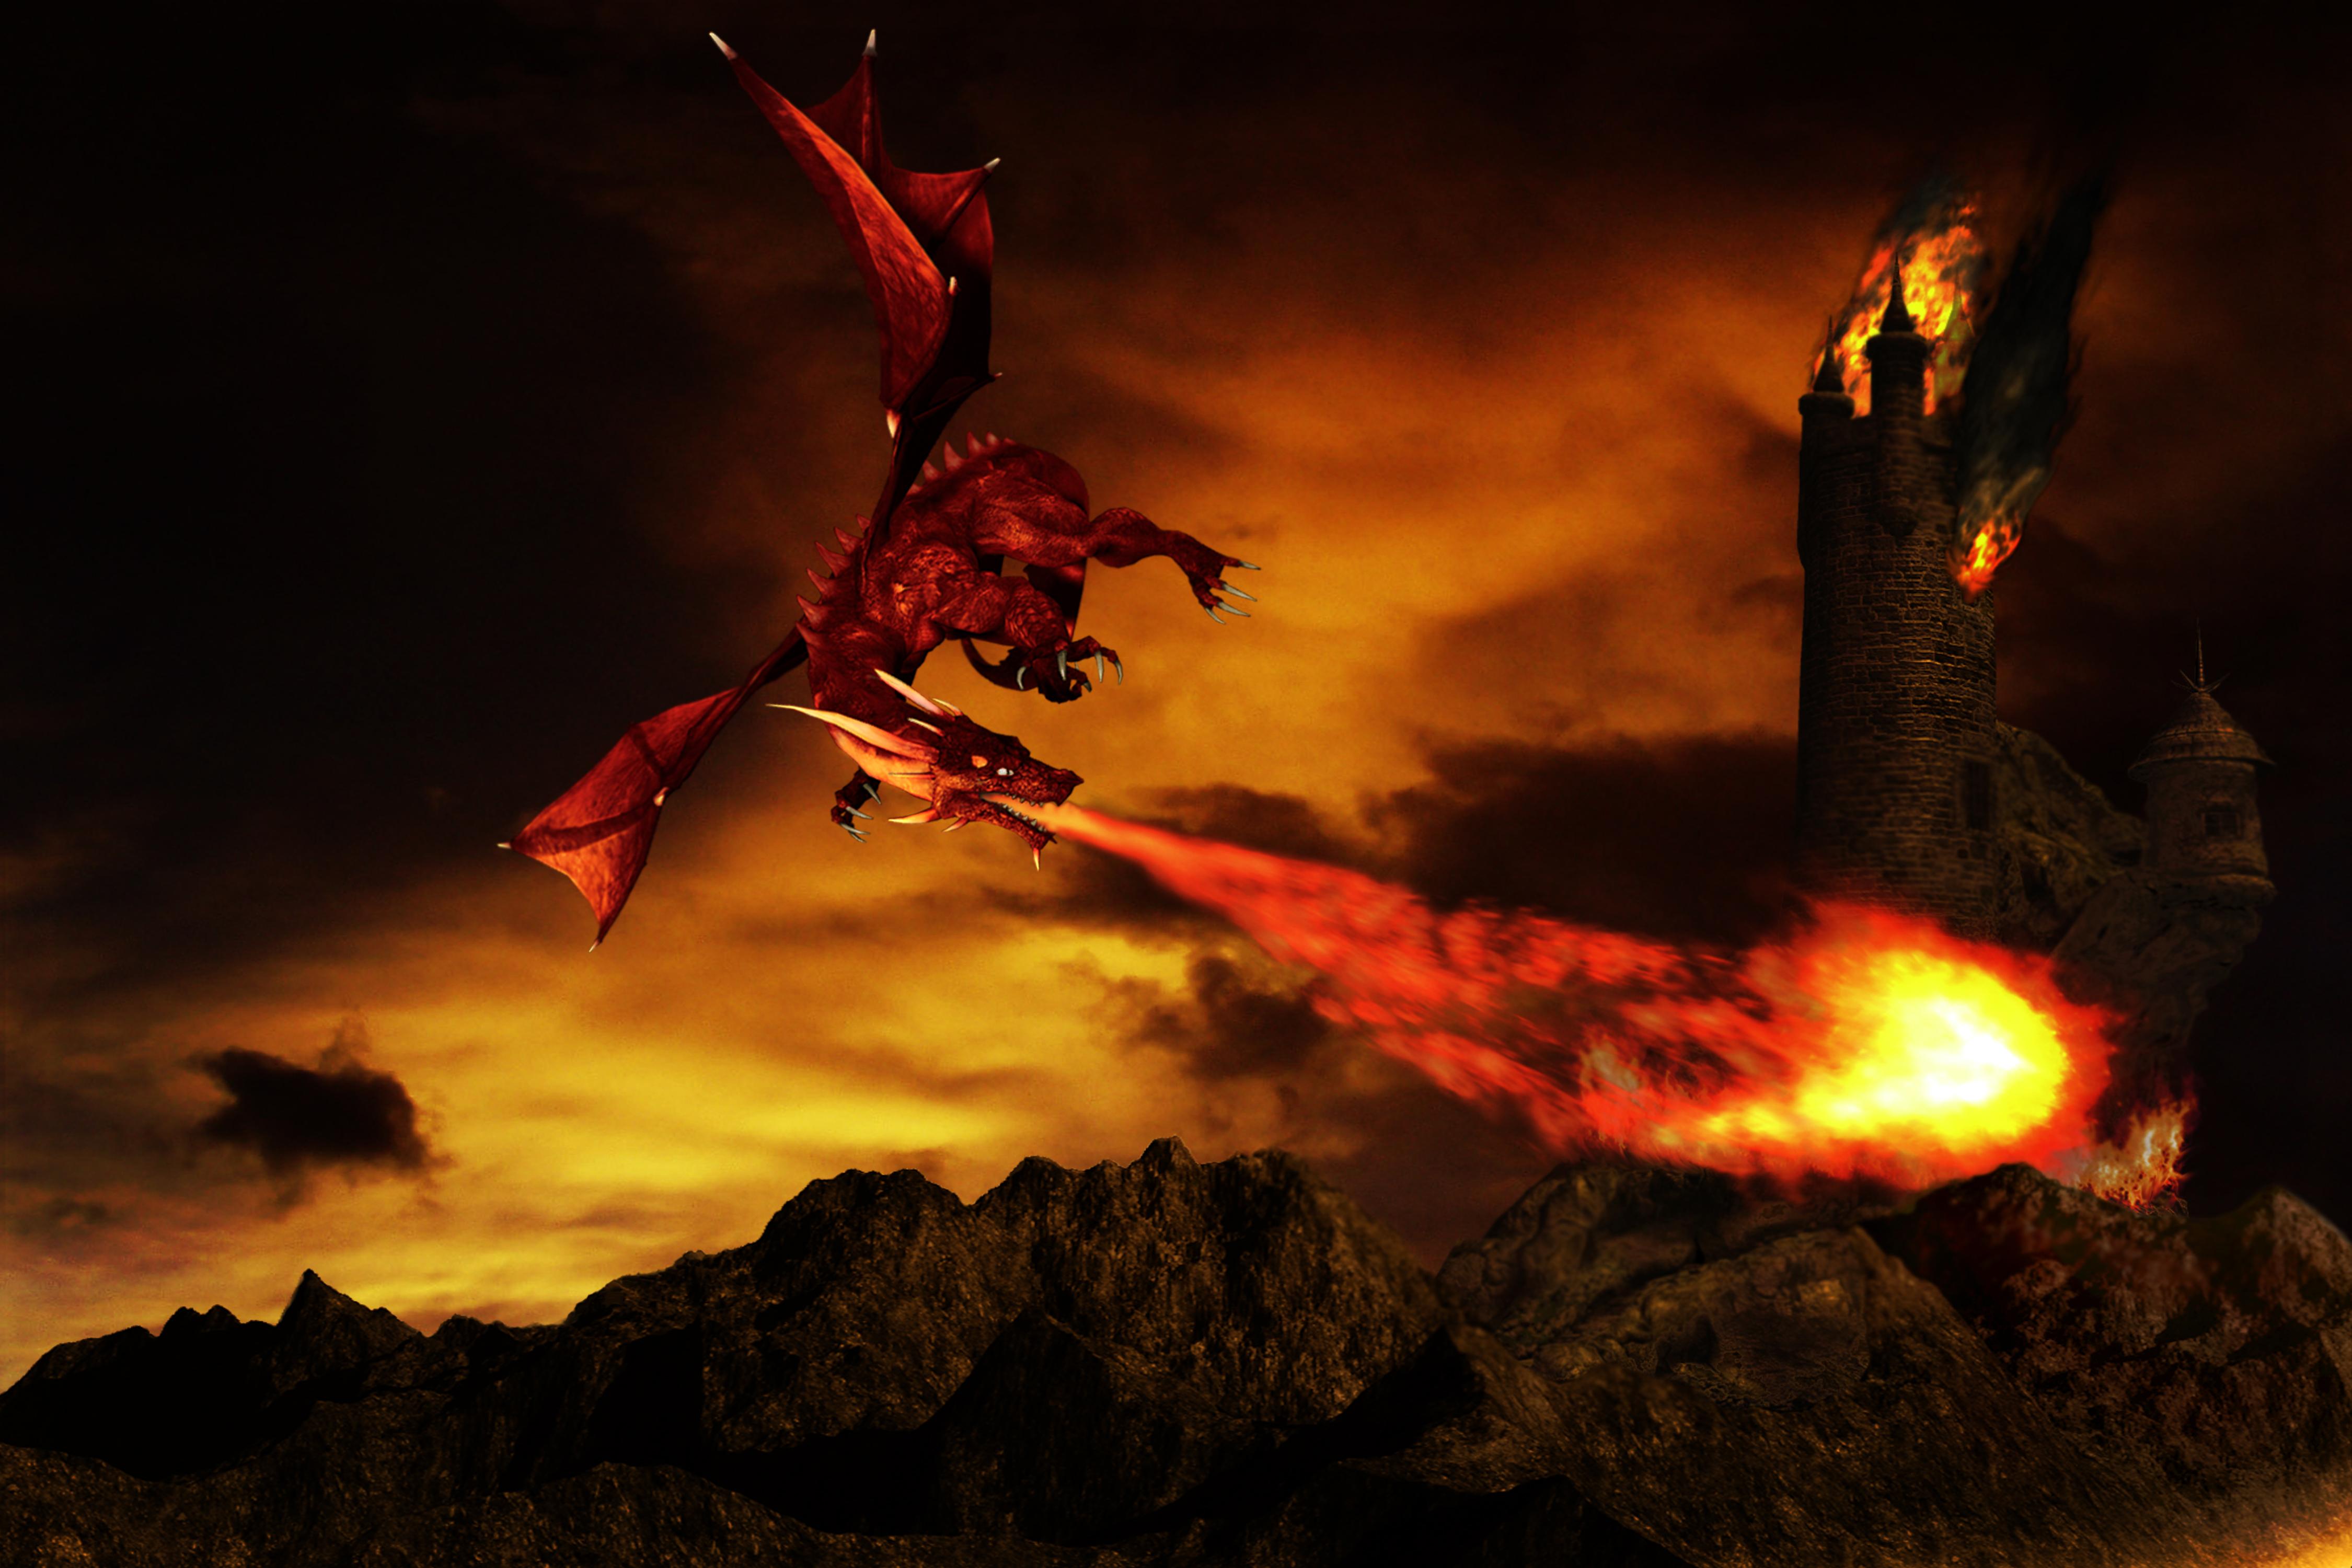 Dragon 4k Ultra HD Wallpaper | Background Image ...